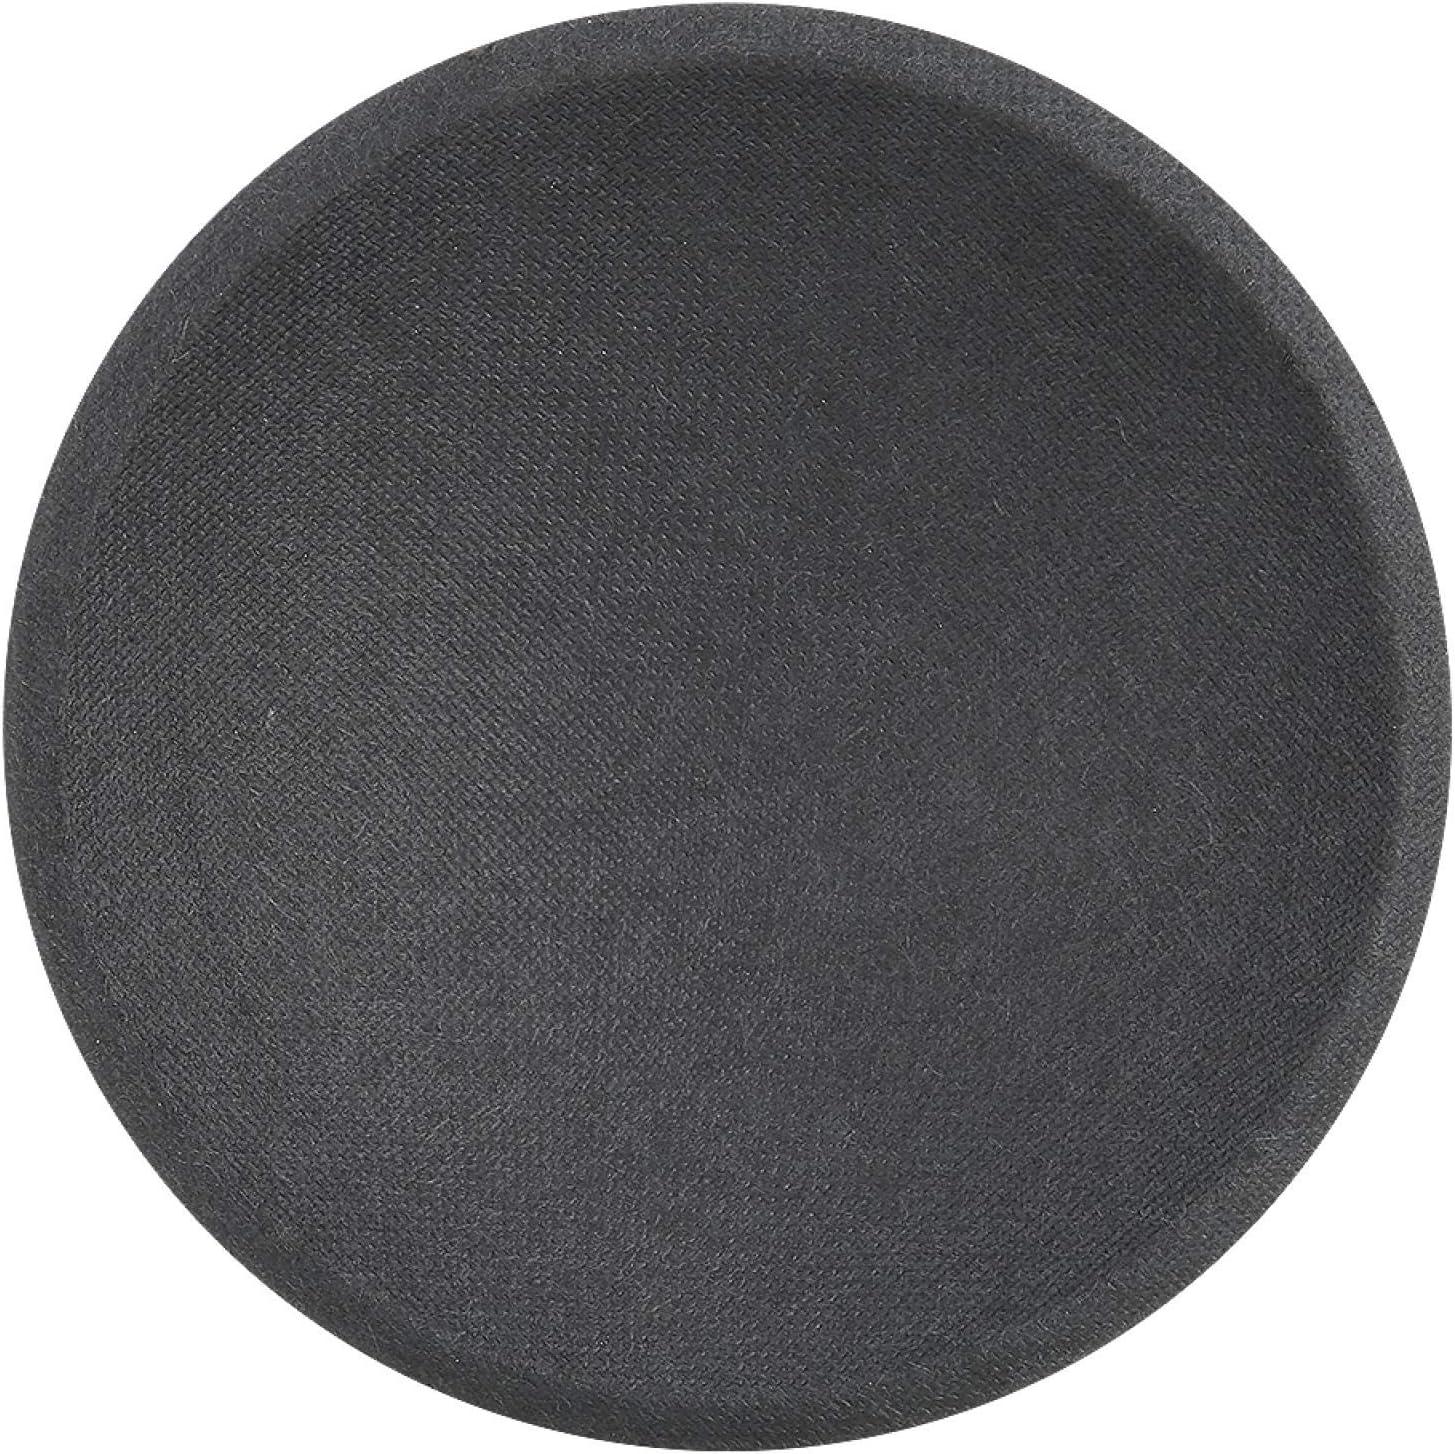 MXZZAND 종이 전문 경적 수호자 안티-먼지 긴 서비스 수명 스피커 무대 KTV 스피커에 대 한 먼지 모자